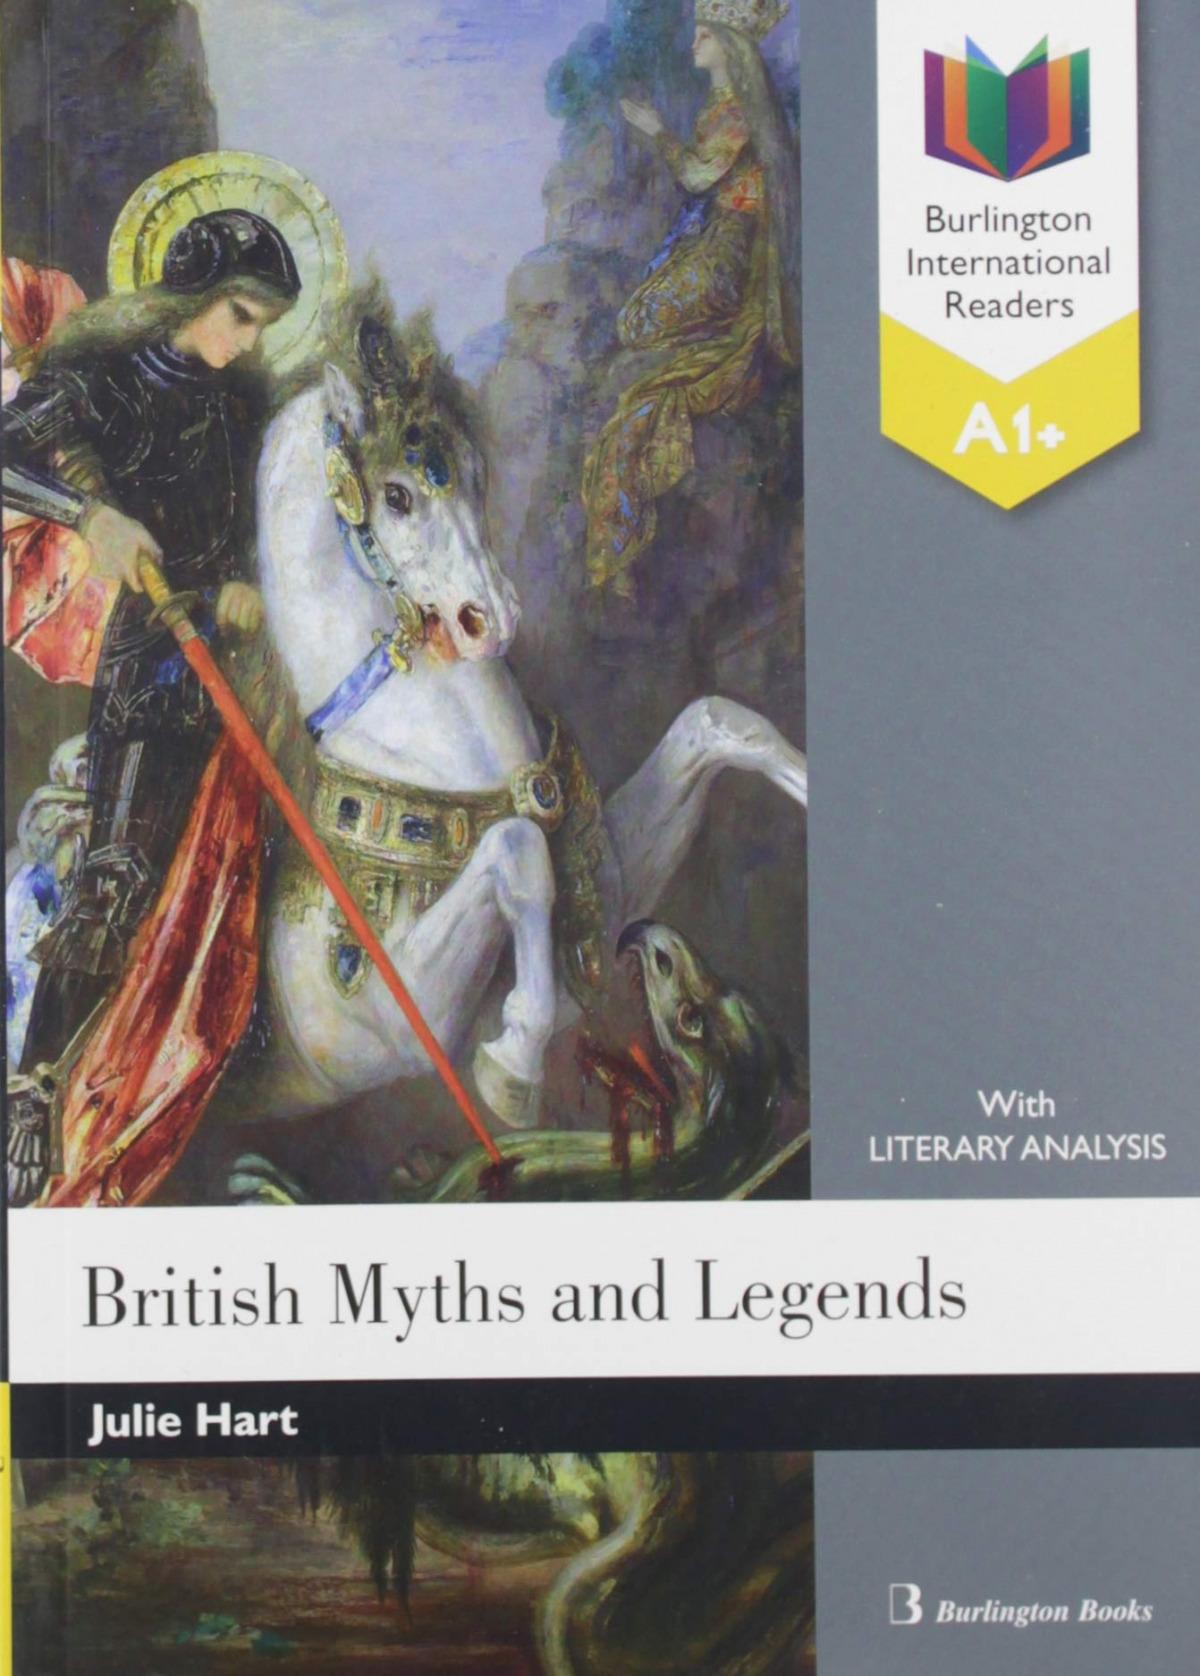 BRITISH MYTHS AND LEGENDS A1+ READER 9789925303502